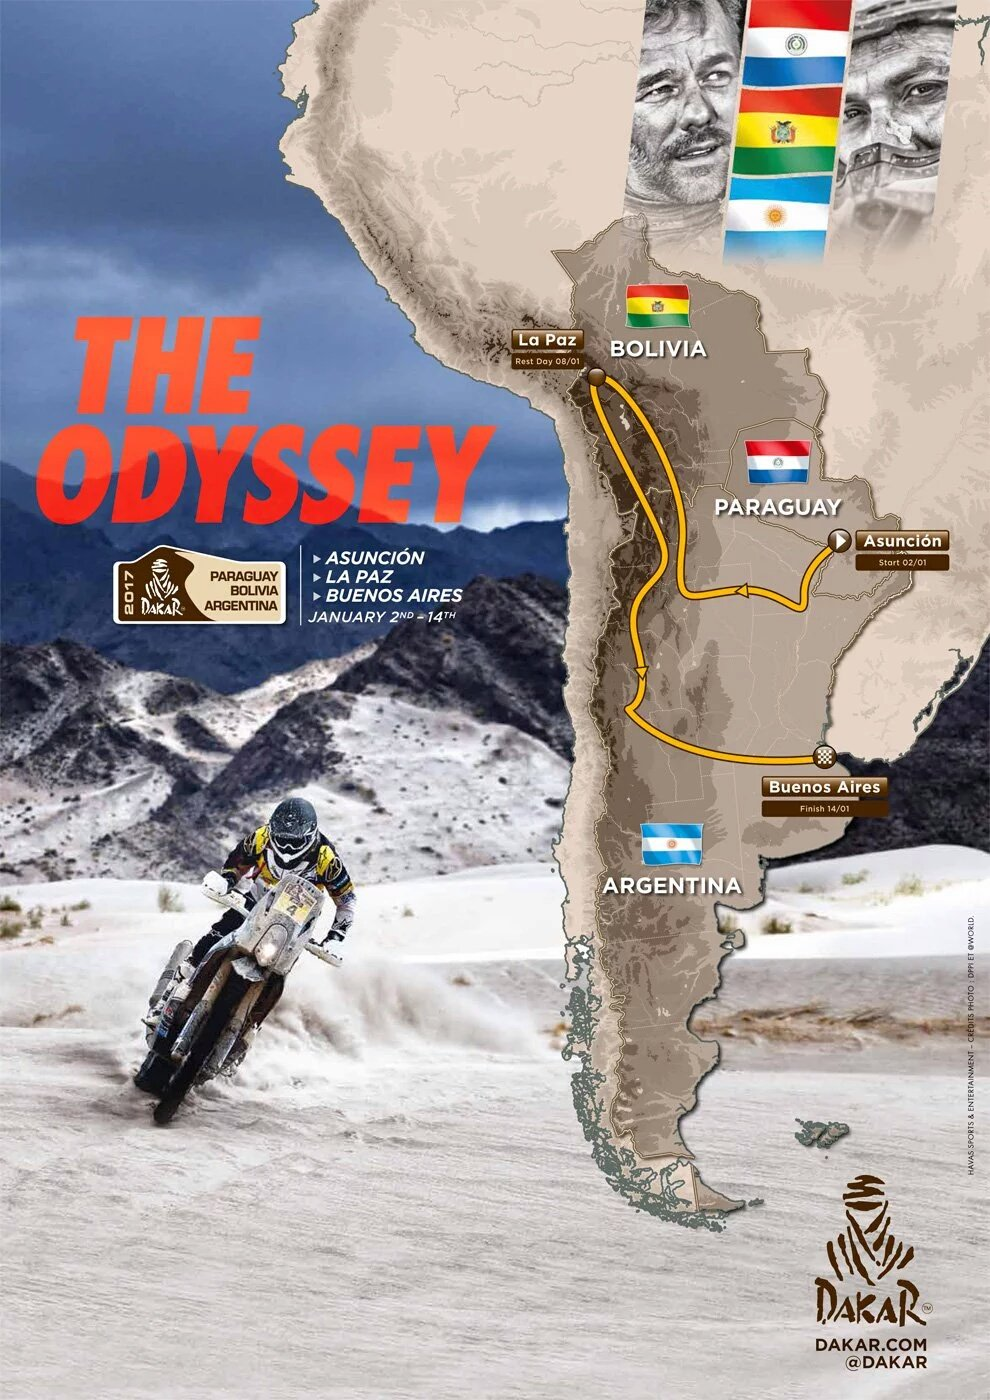 2016 Rallye Raid Dakar Argentina - Bolivia [3-16 Enero] - Página 10 Cg9F9Z2WkAAy8M2